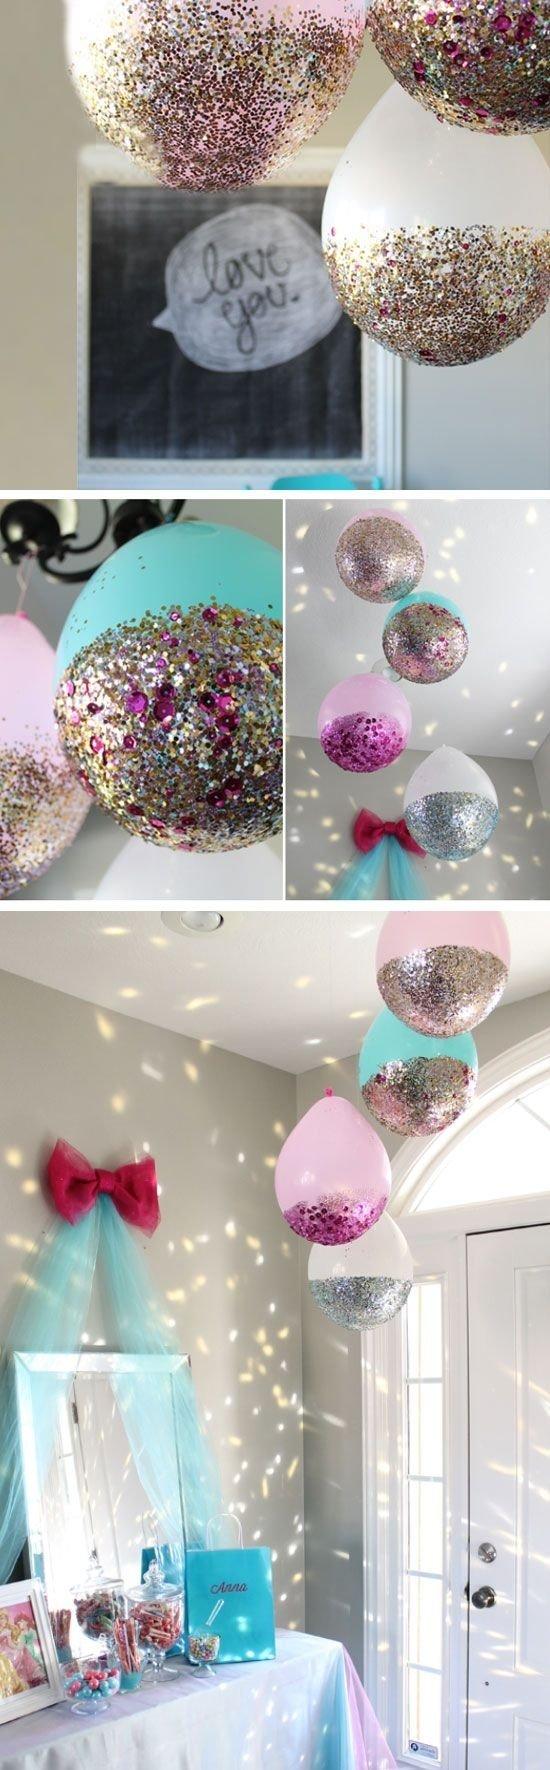 10 Fabulous New Years Eve Birthday Party Ideas 10 amazing new years eve party ideas check unicorns and birthdays 2020